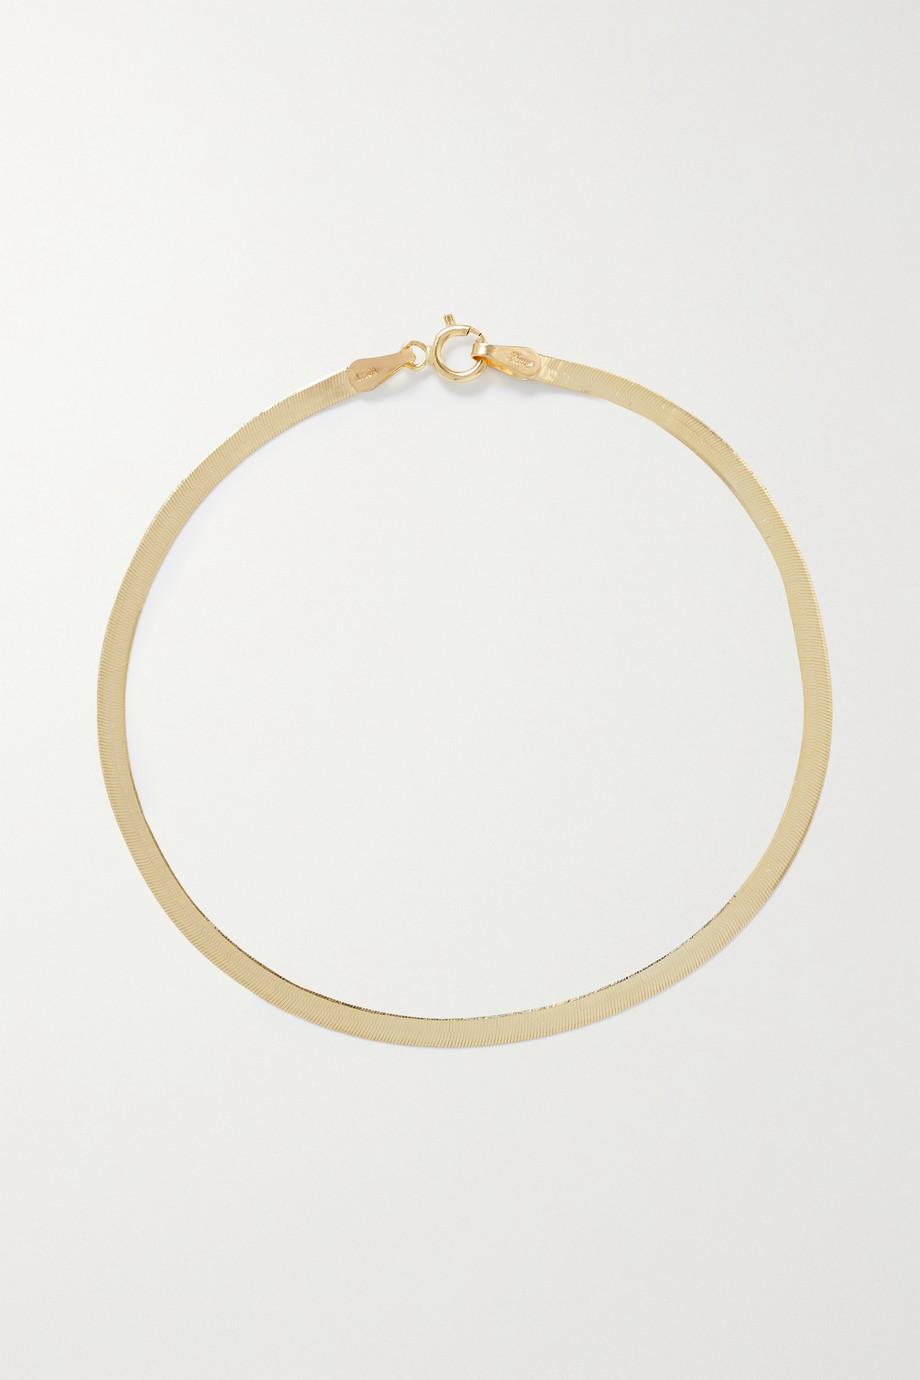 Loren Stewart Herringbone Armband aus 10 Karat Gold